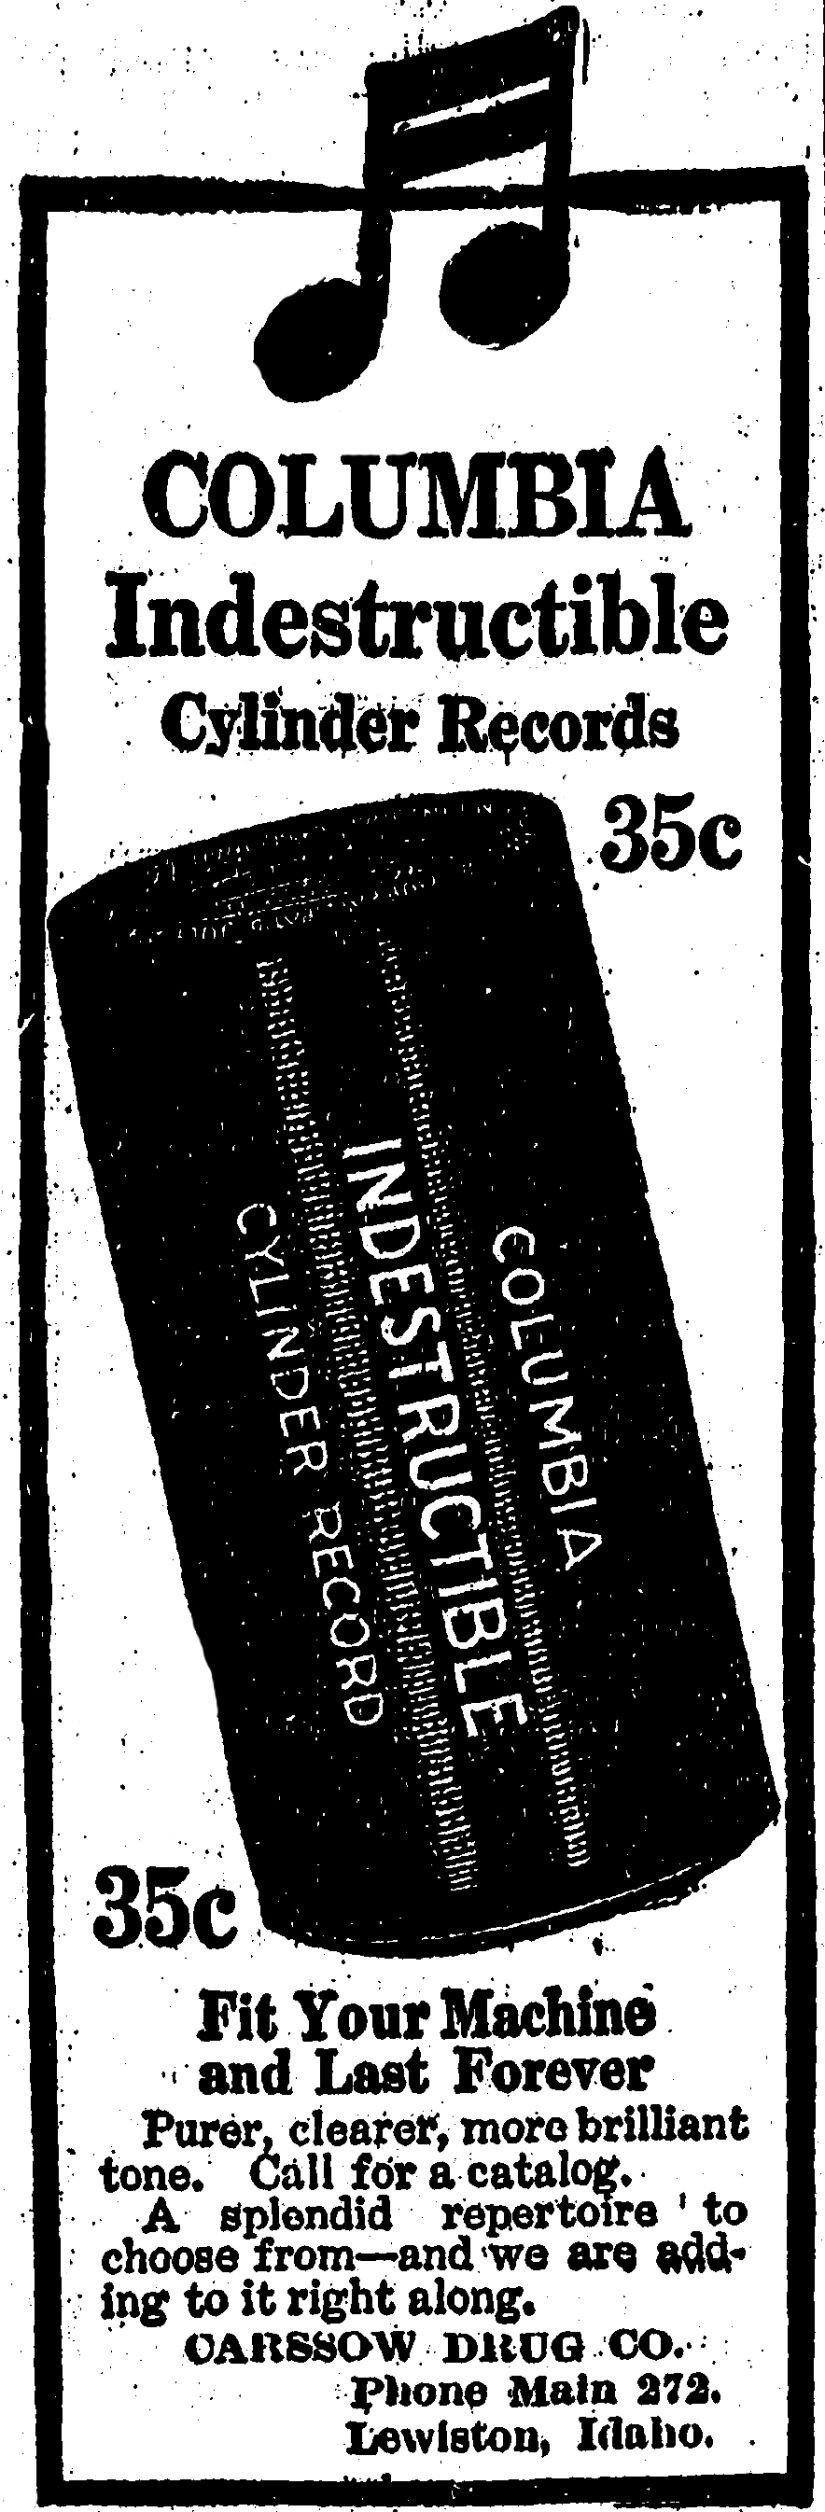 FB 10 12 1910 Columbia.jpg